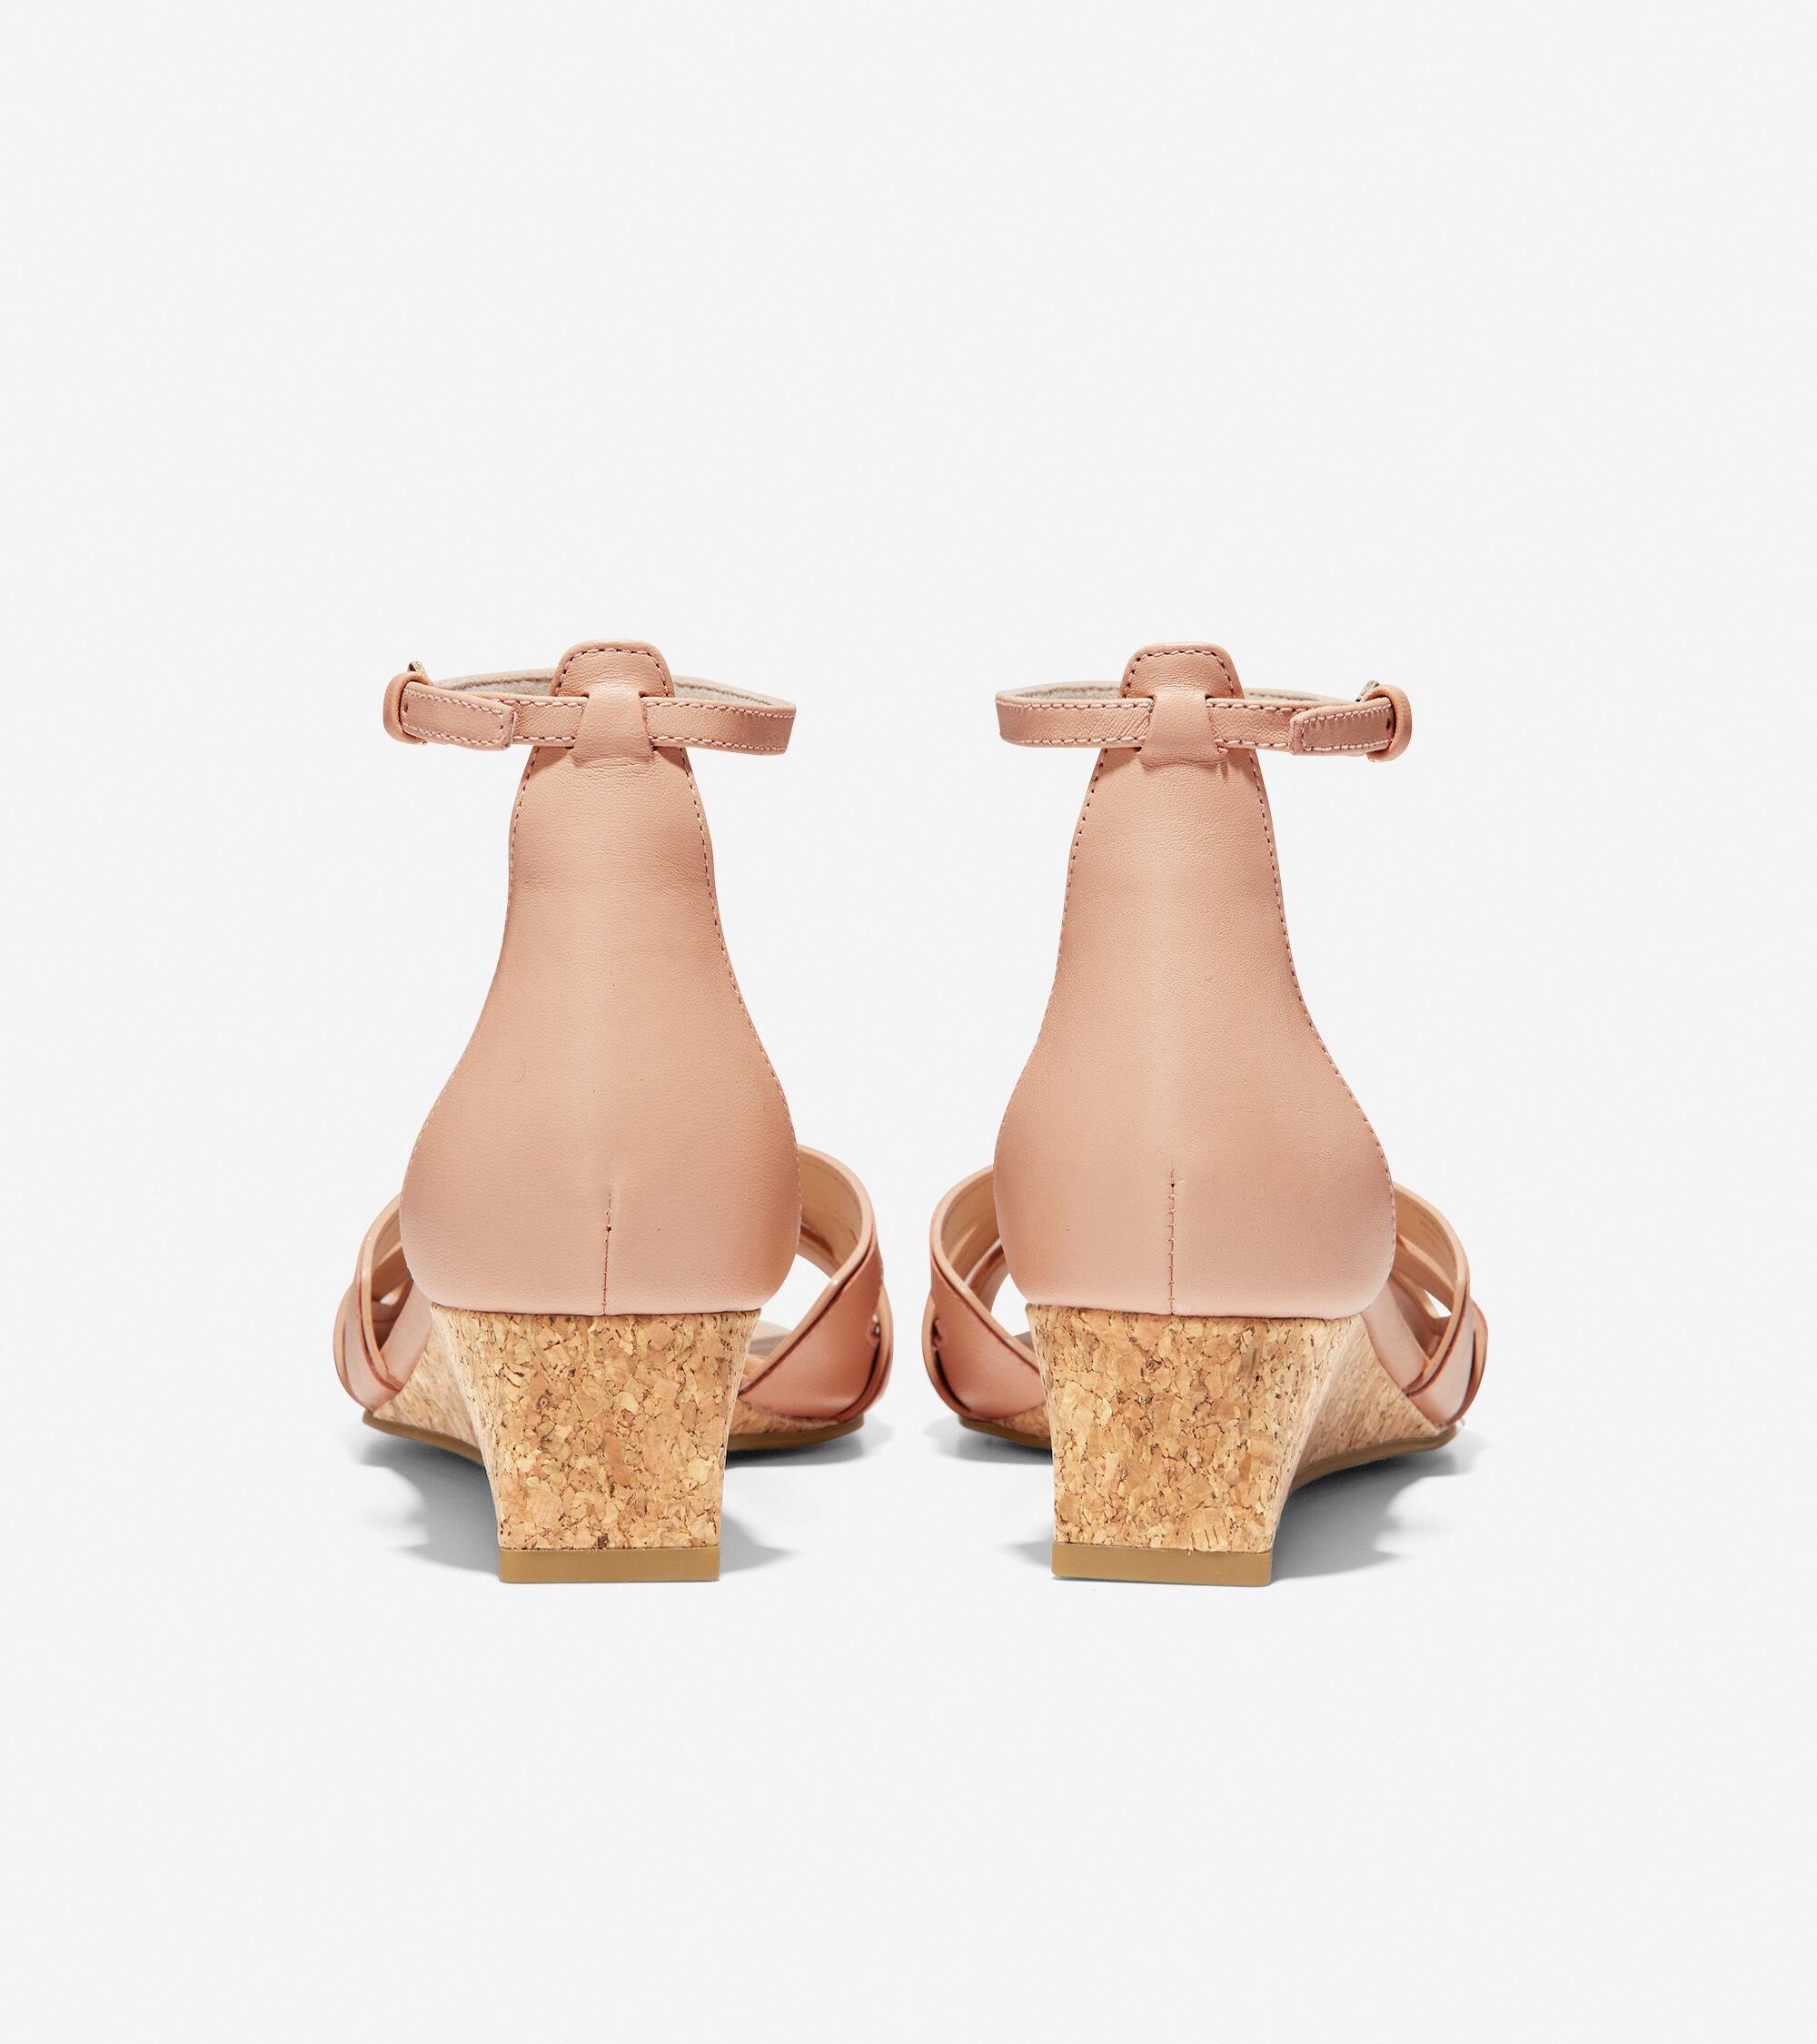 952f0335b Cole Haan Hana Grand Wedge in Mahogany Rose Leather-Patent Cork ...